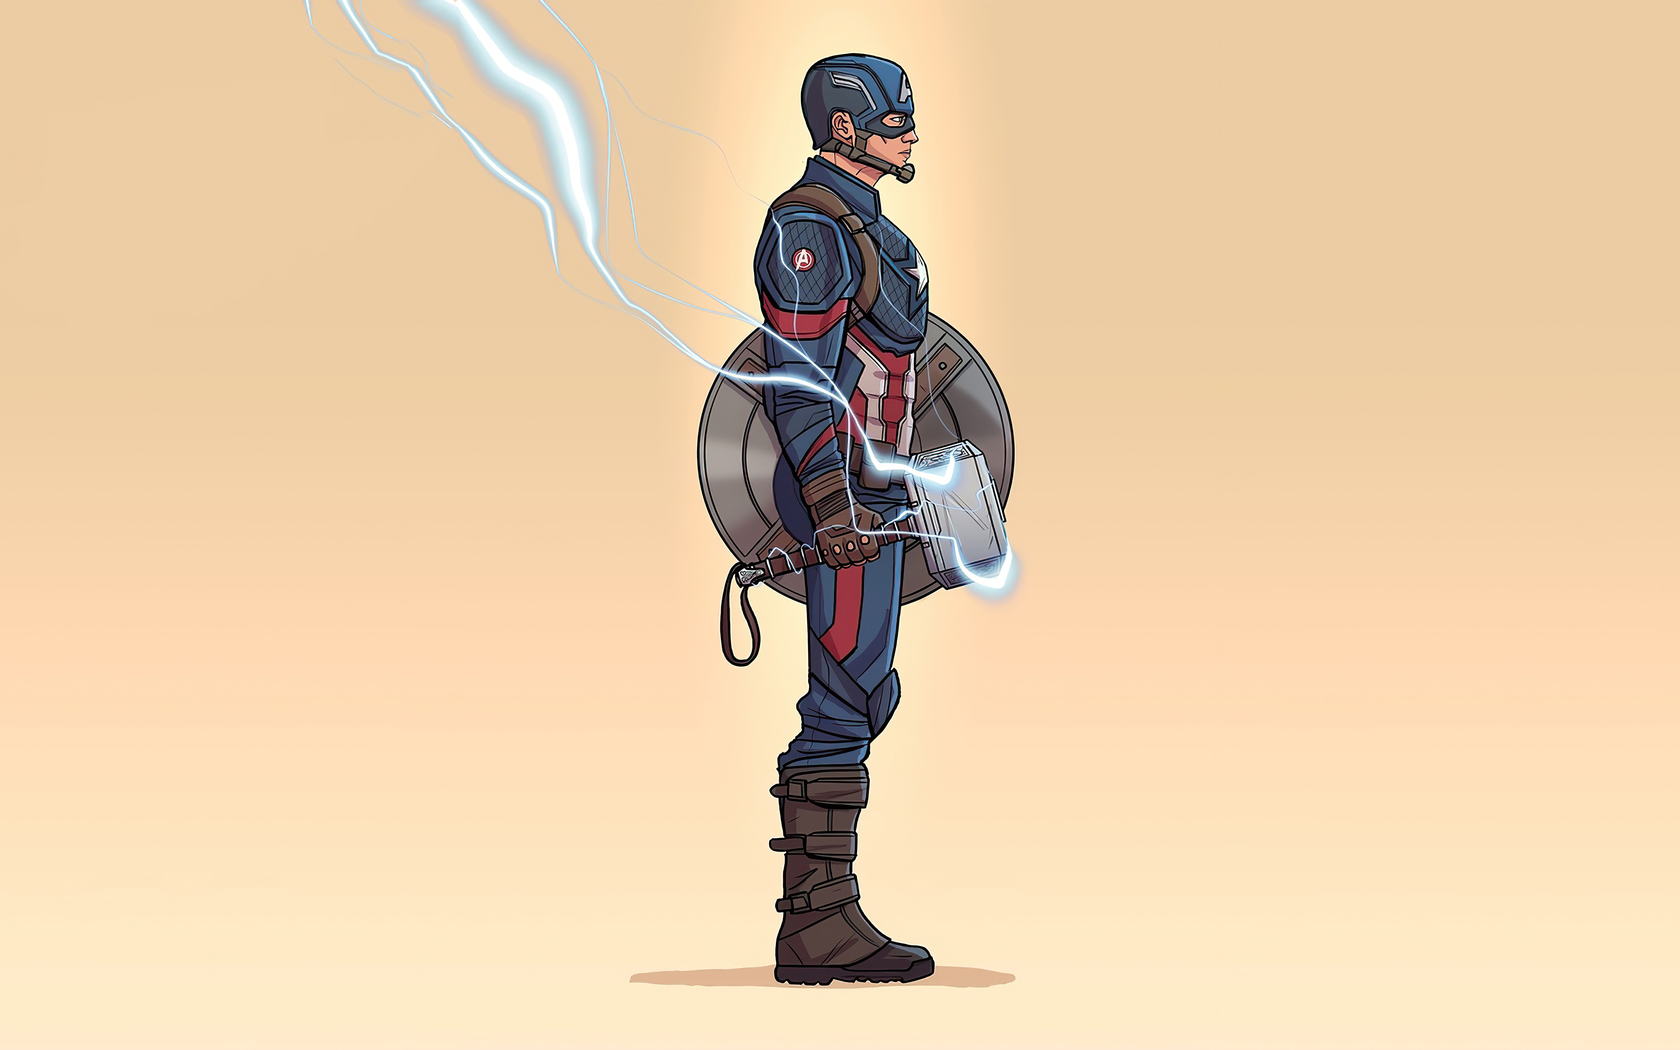 4k-captain-america-minimalism-2020-xt.jpg